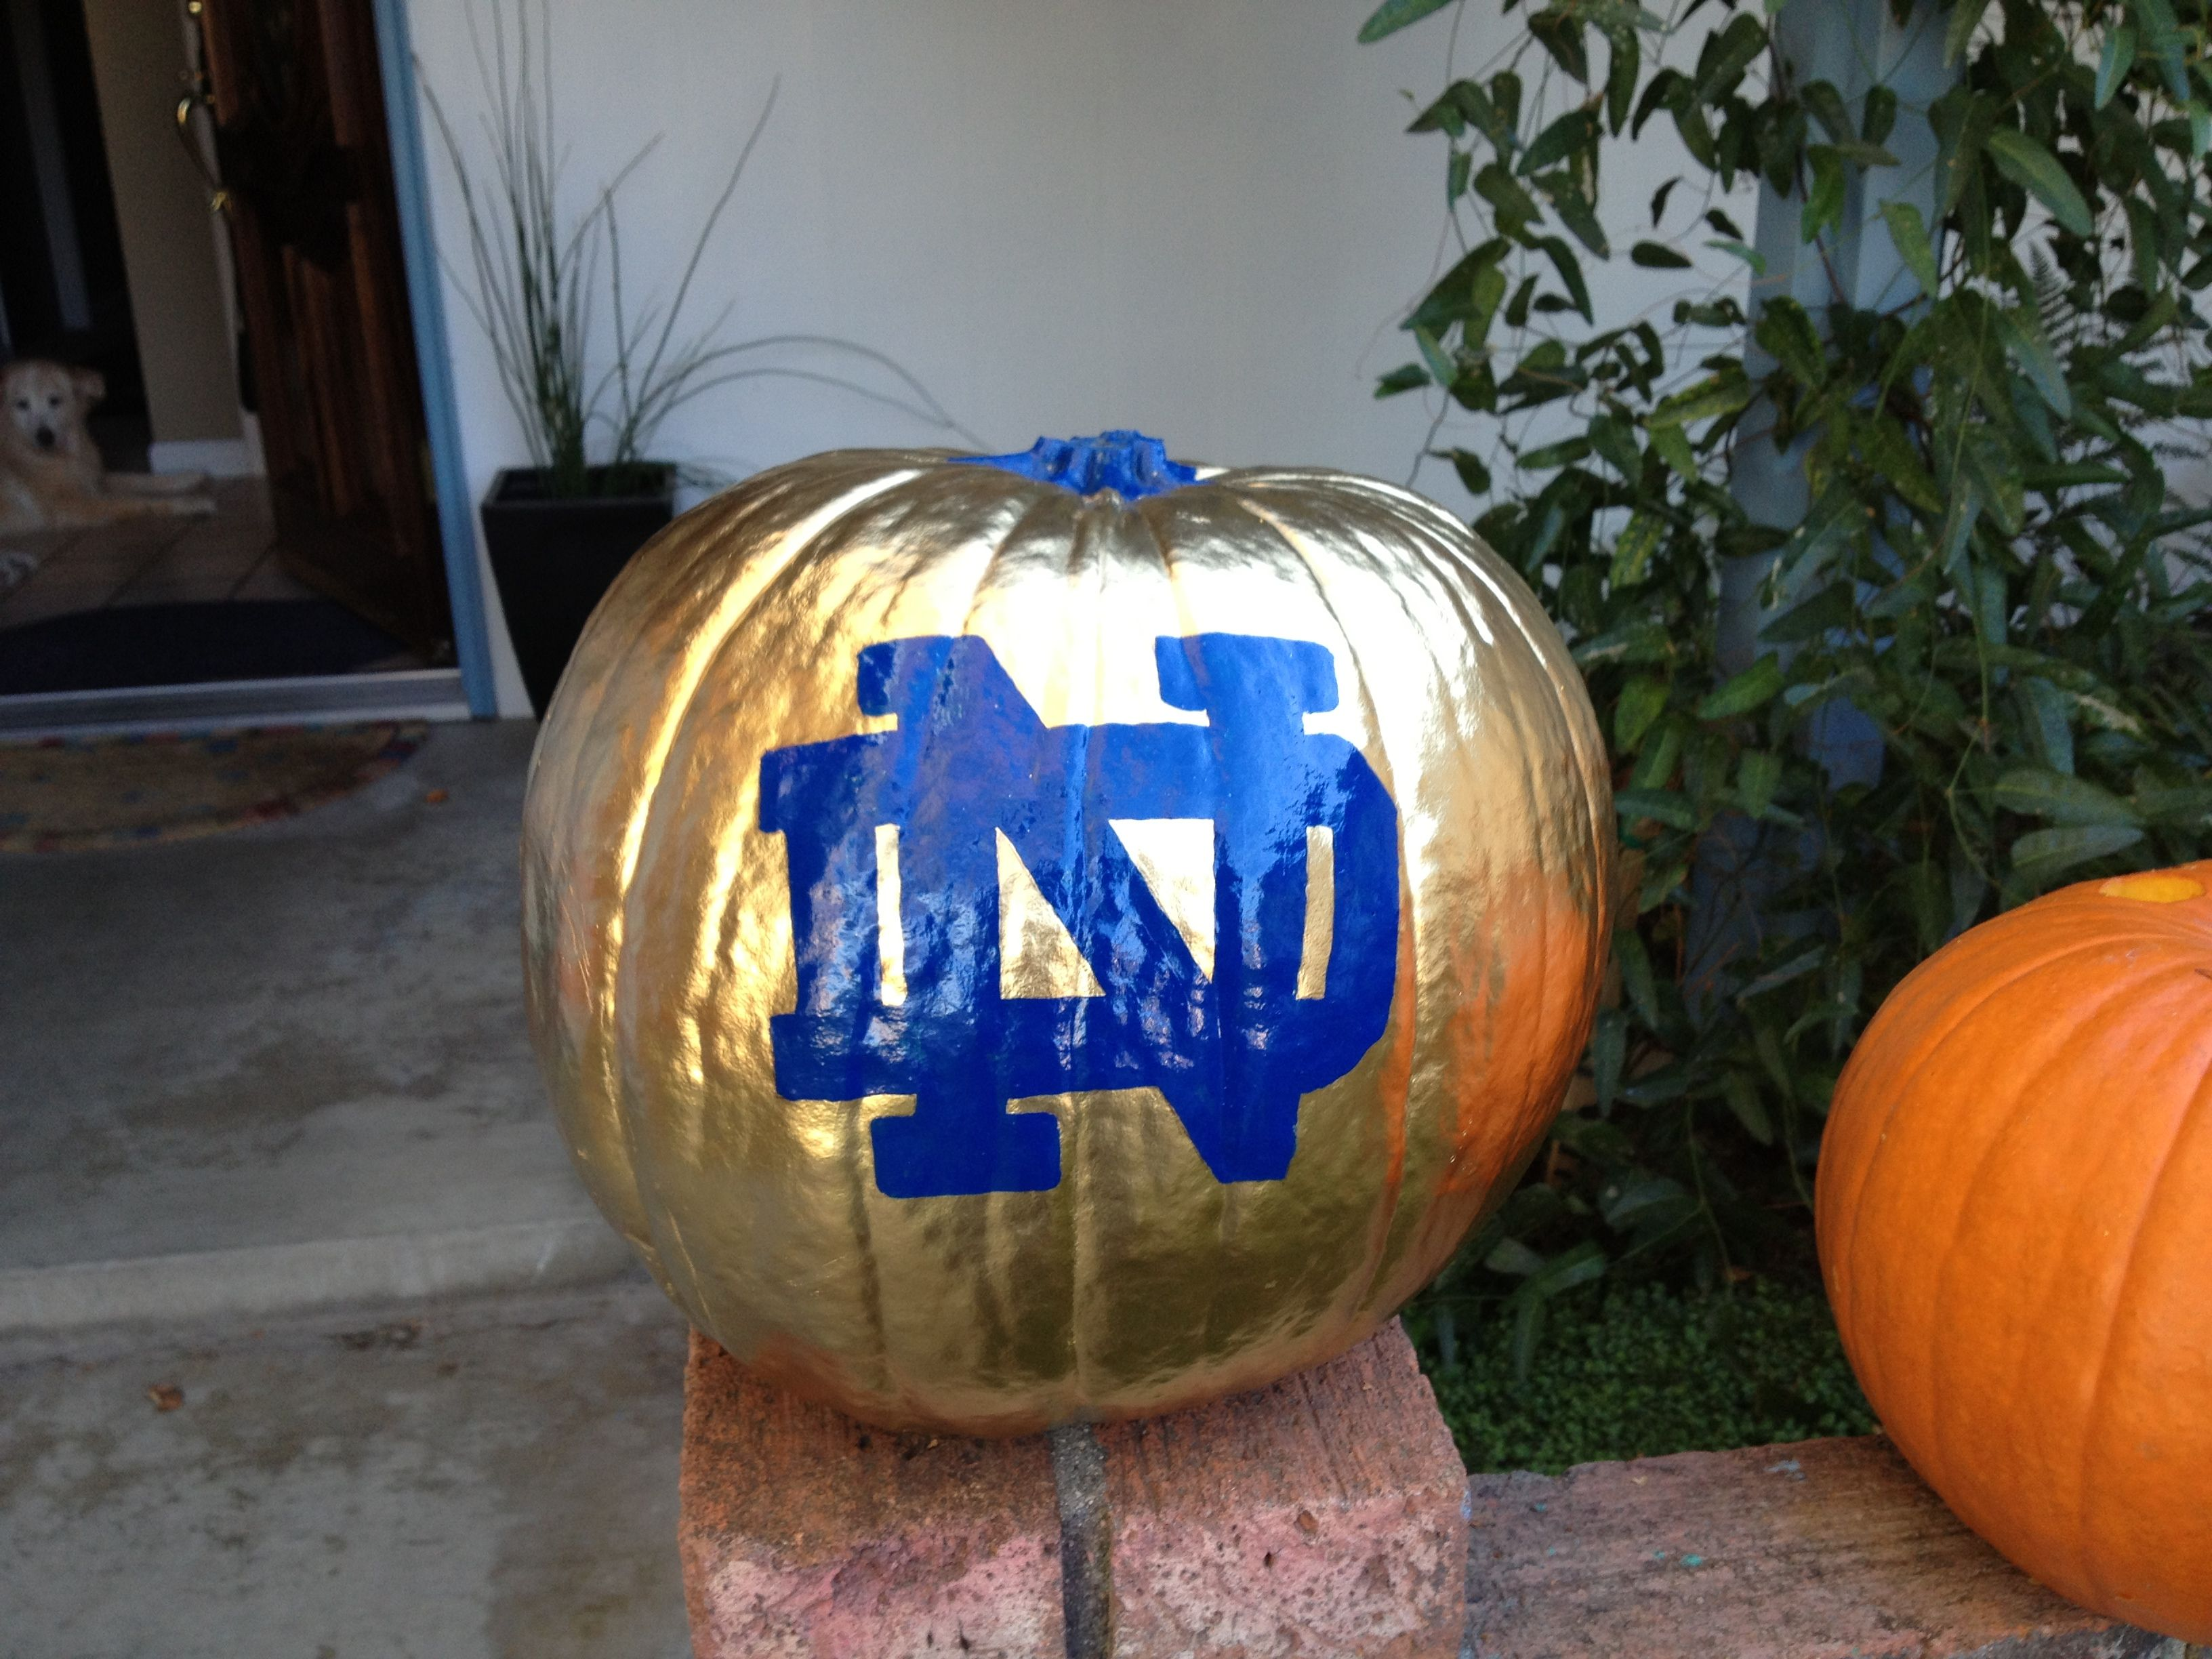 College Football Pumpkin Carving Patterns Www Topsimages Com